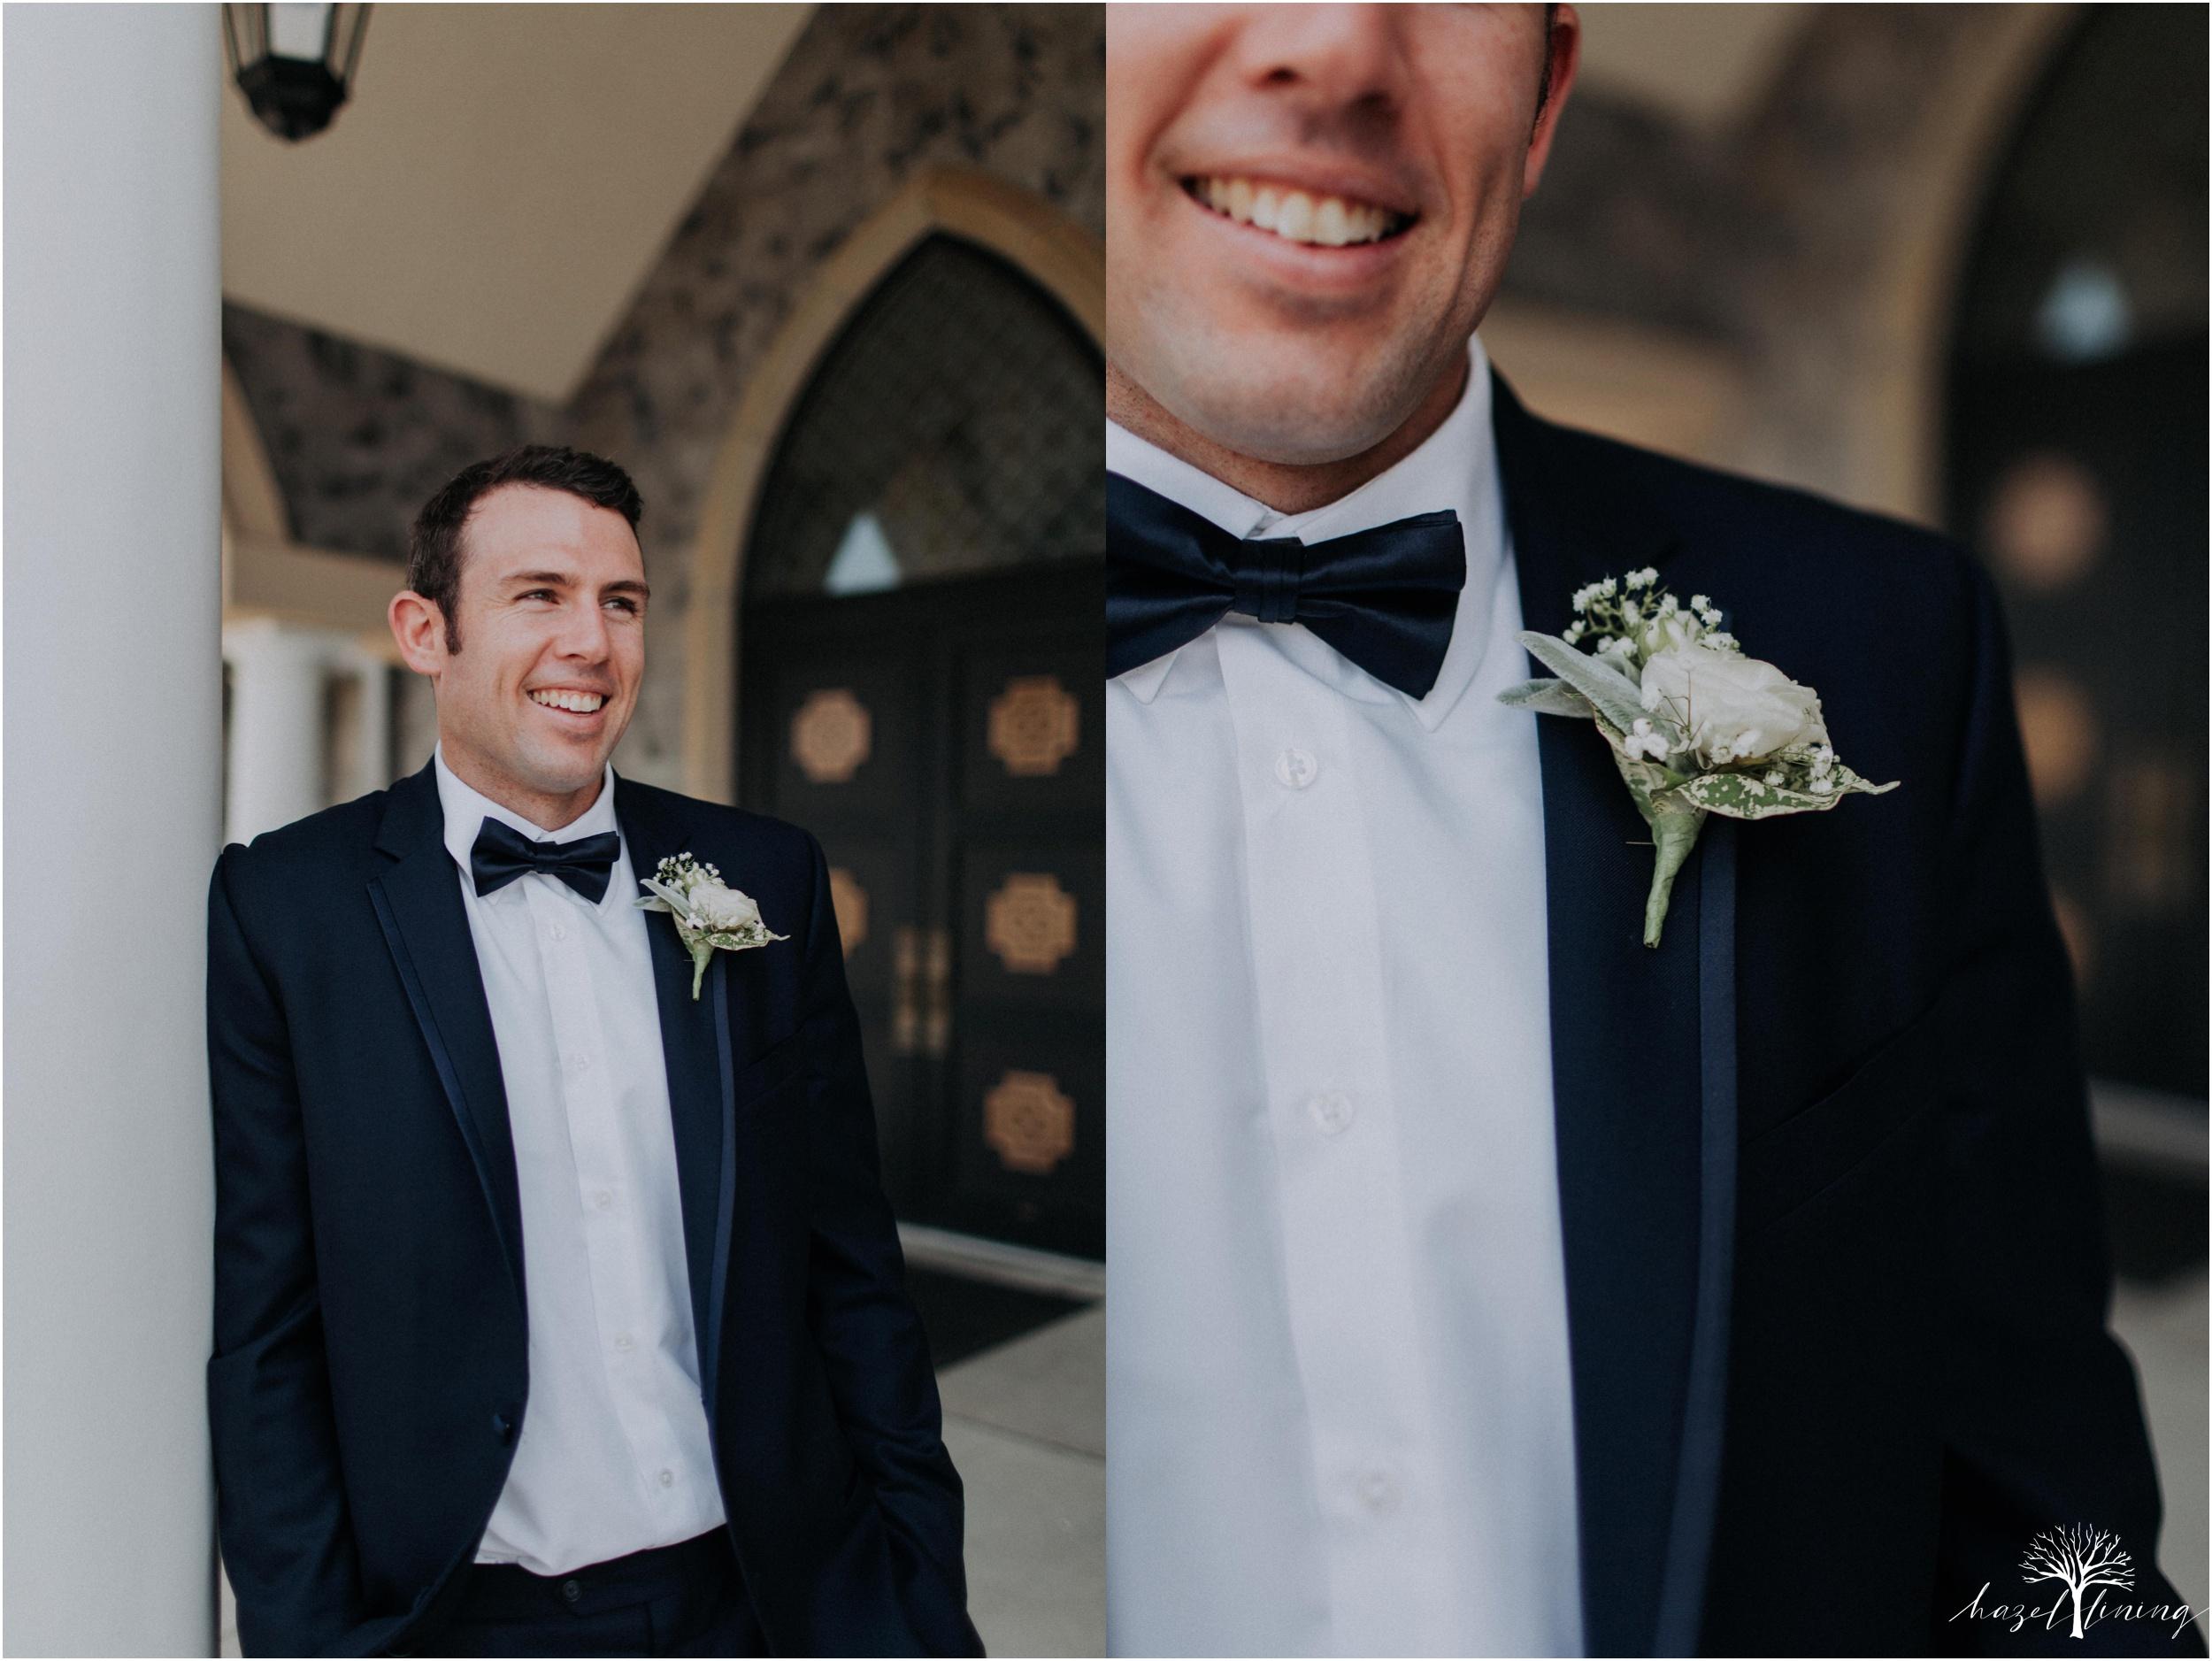 hazel-lining-travel-wedding-elopement-photography_0043.jpg